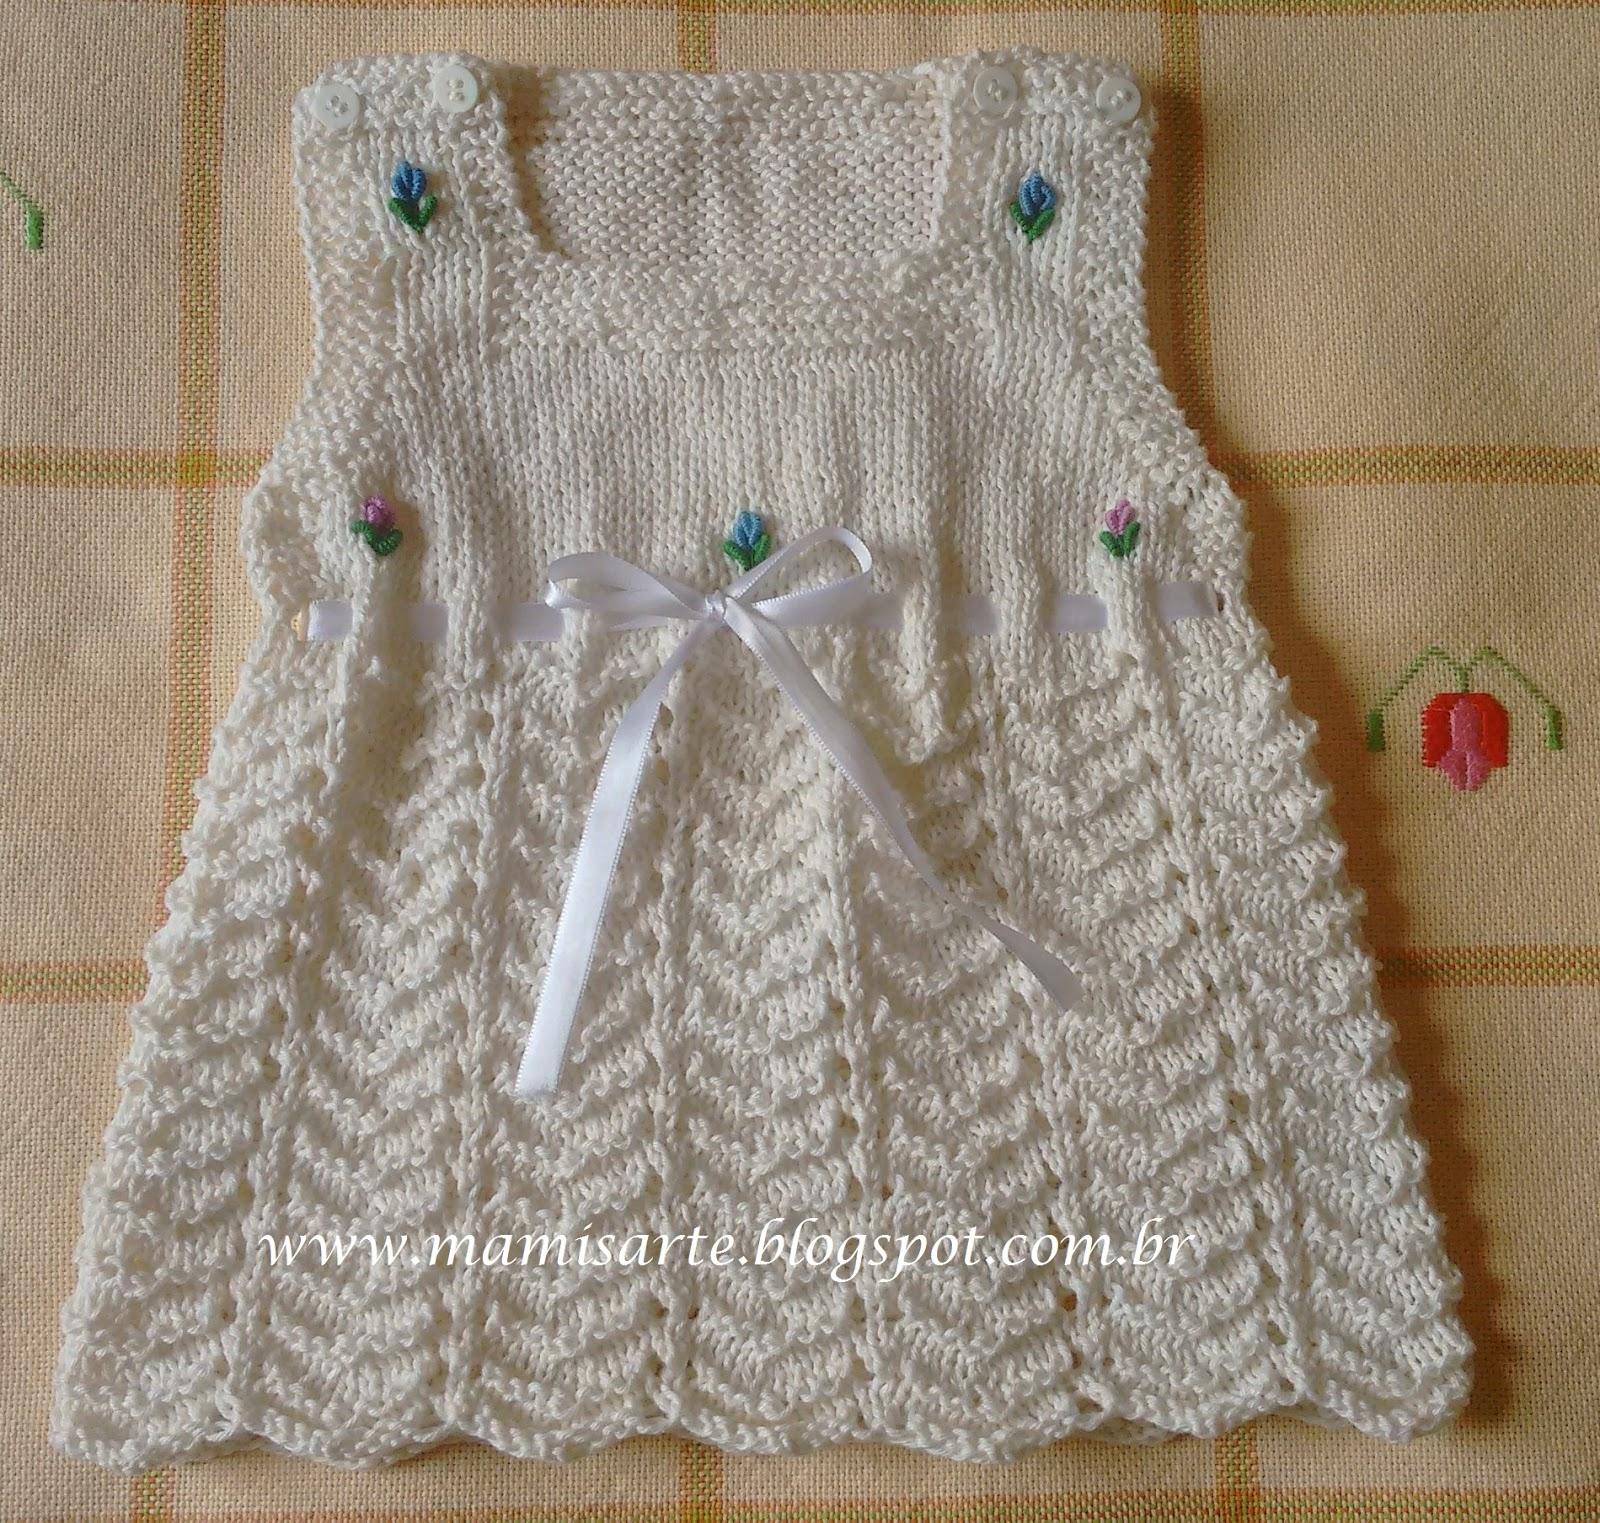 Crochet et tricot da mamis vestido ver o beb em tricot - Cote 2 2 tricot ...